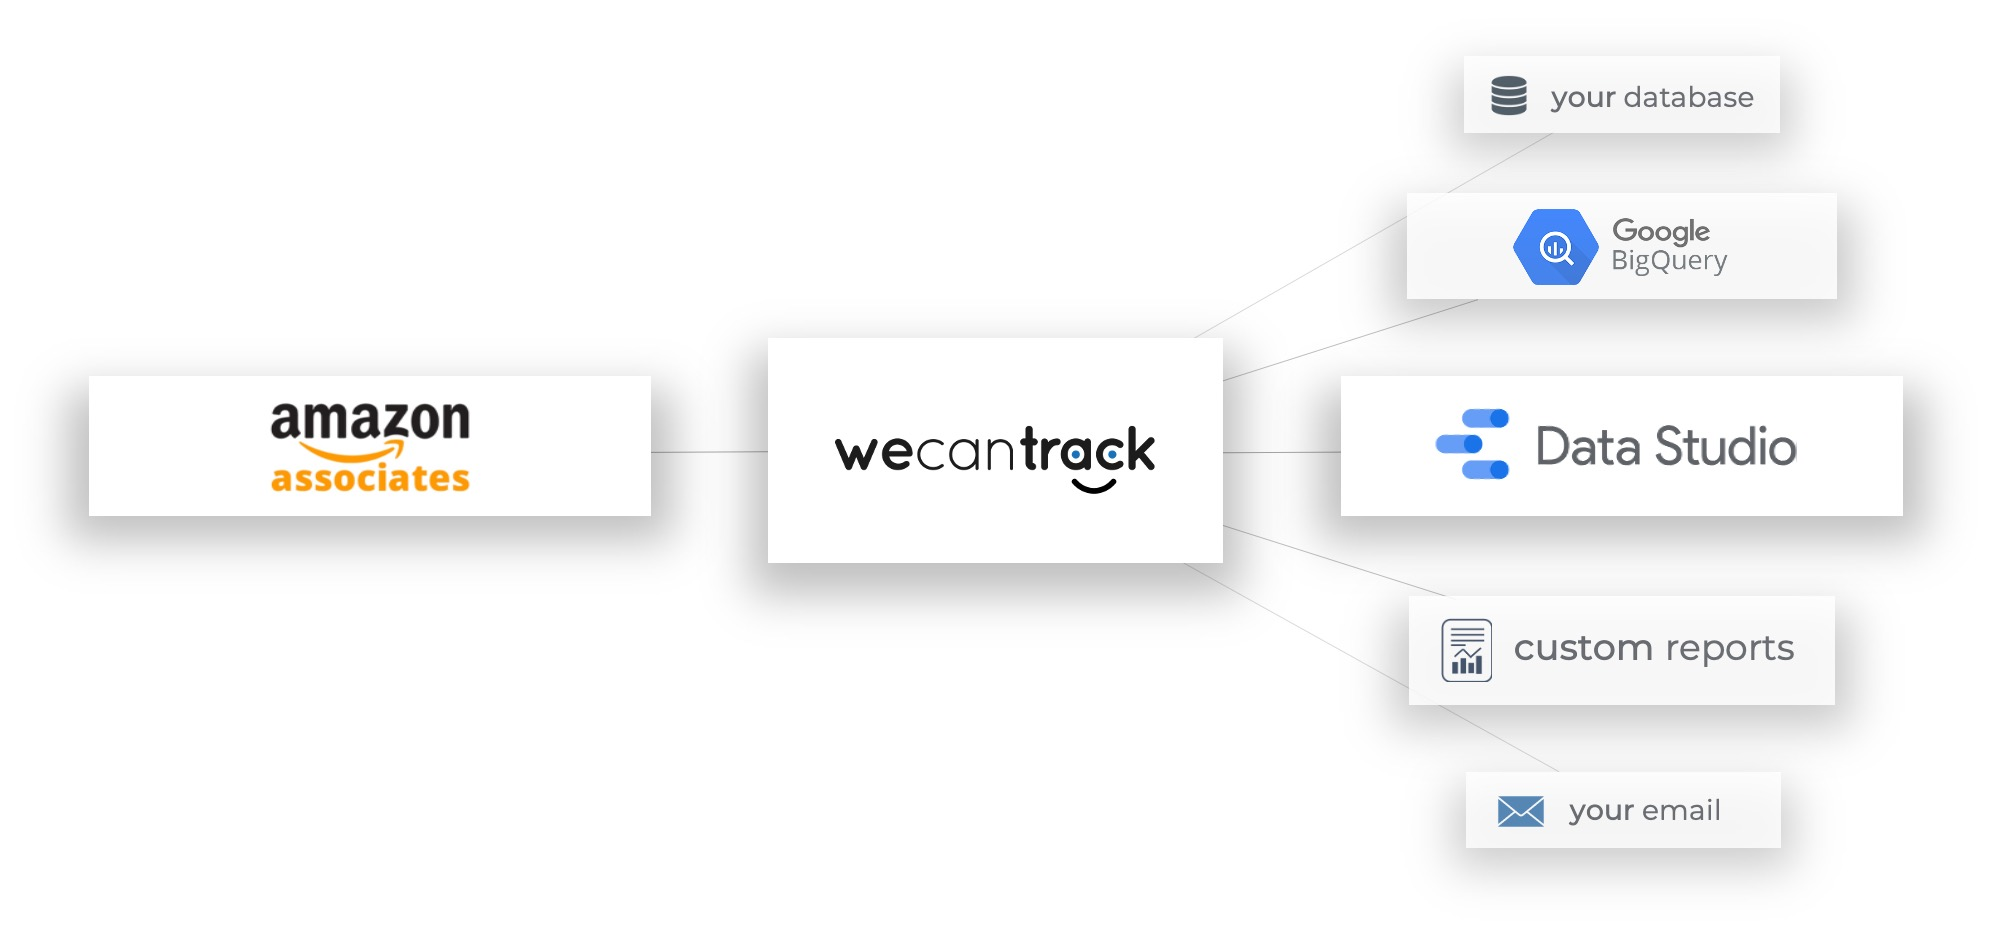 amazon-associates-conversion-data-integration-tool